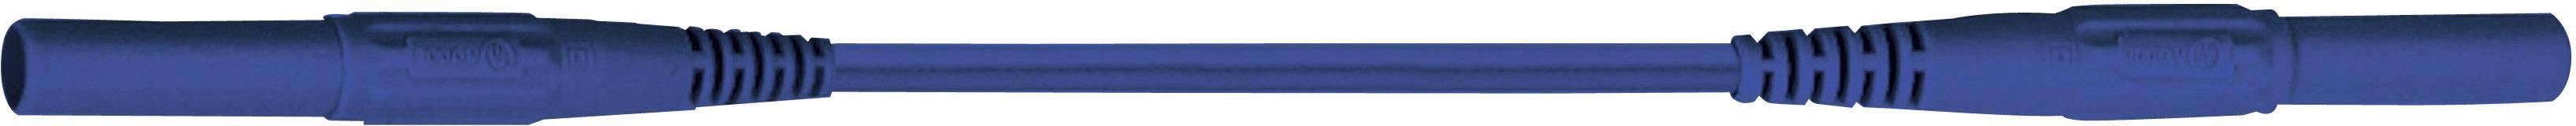 Merací kábel Multicontact XMF-419, 2,5 mm², 1 m, modrý